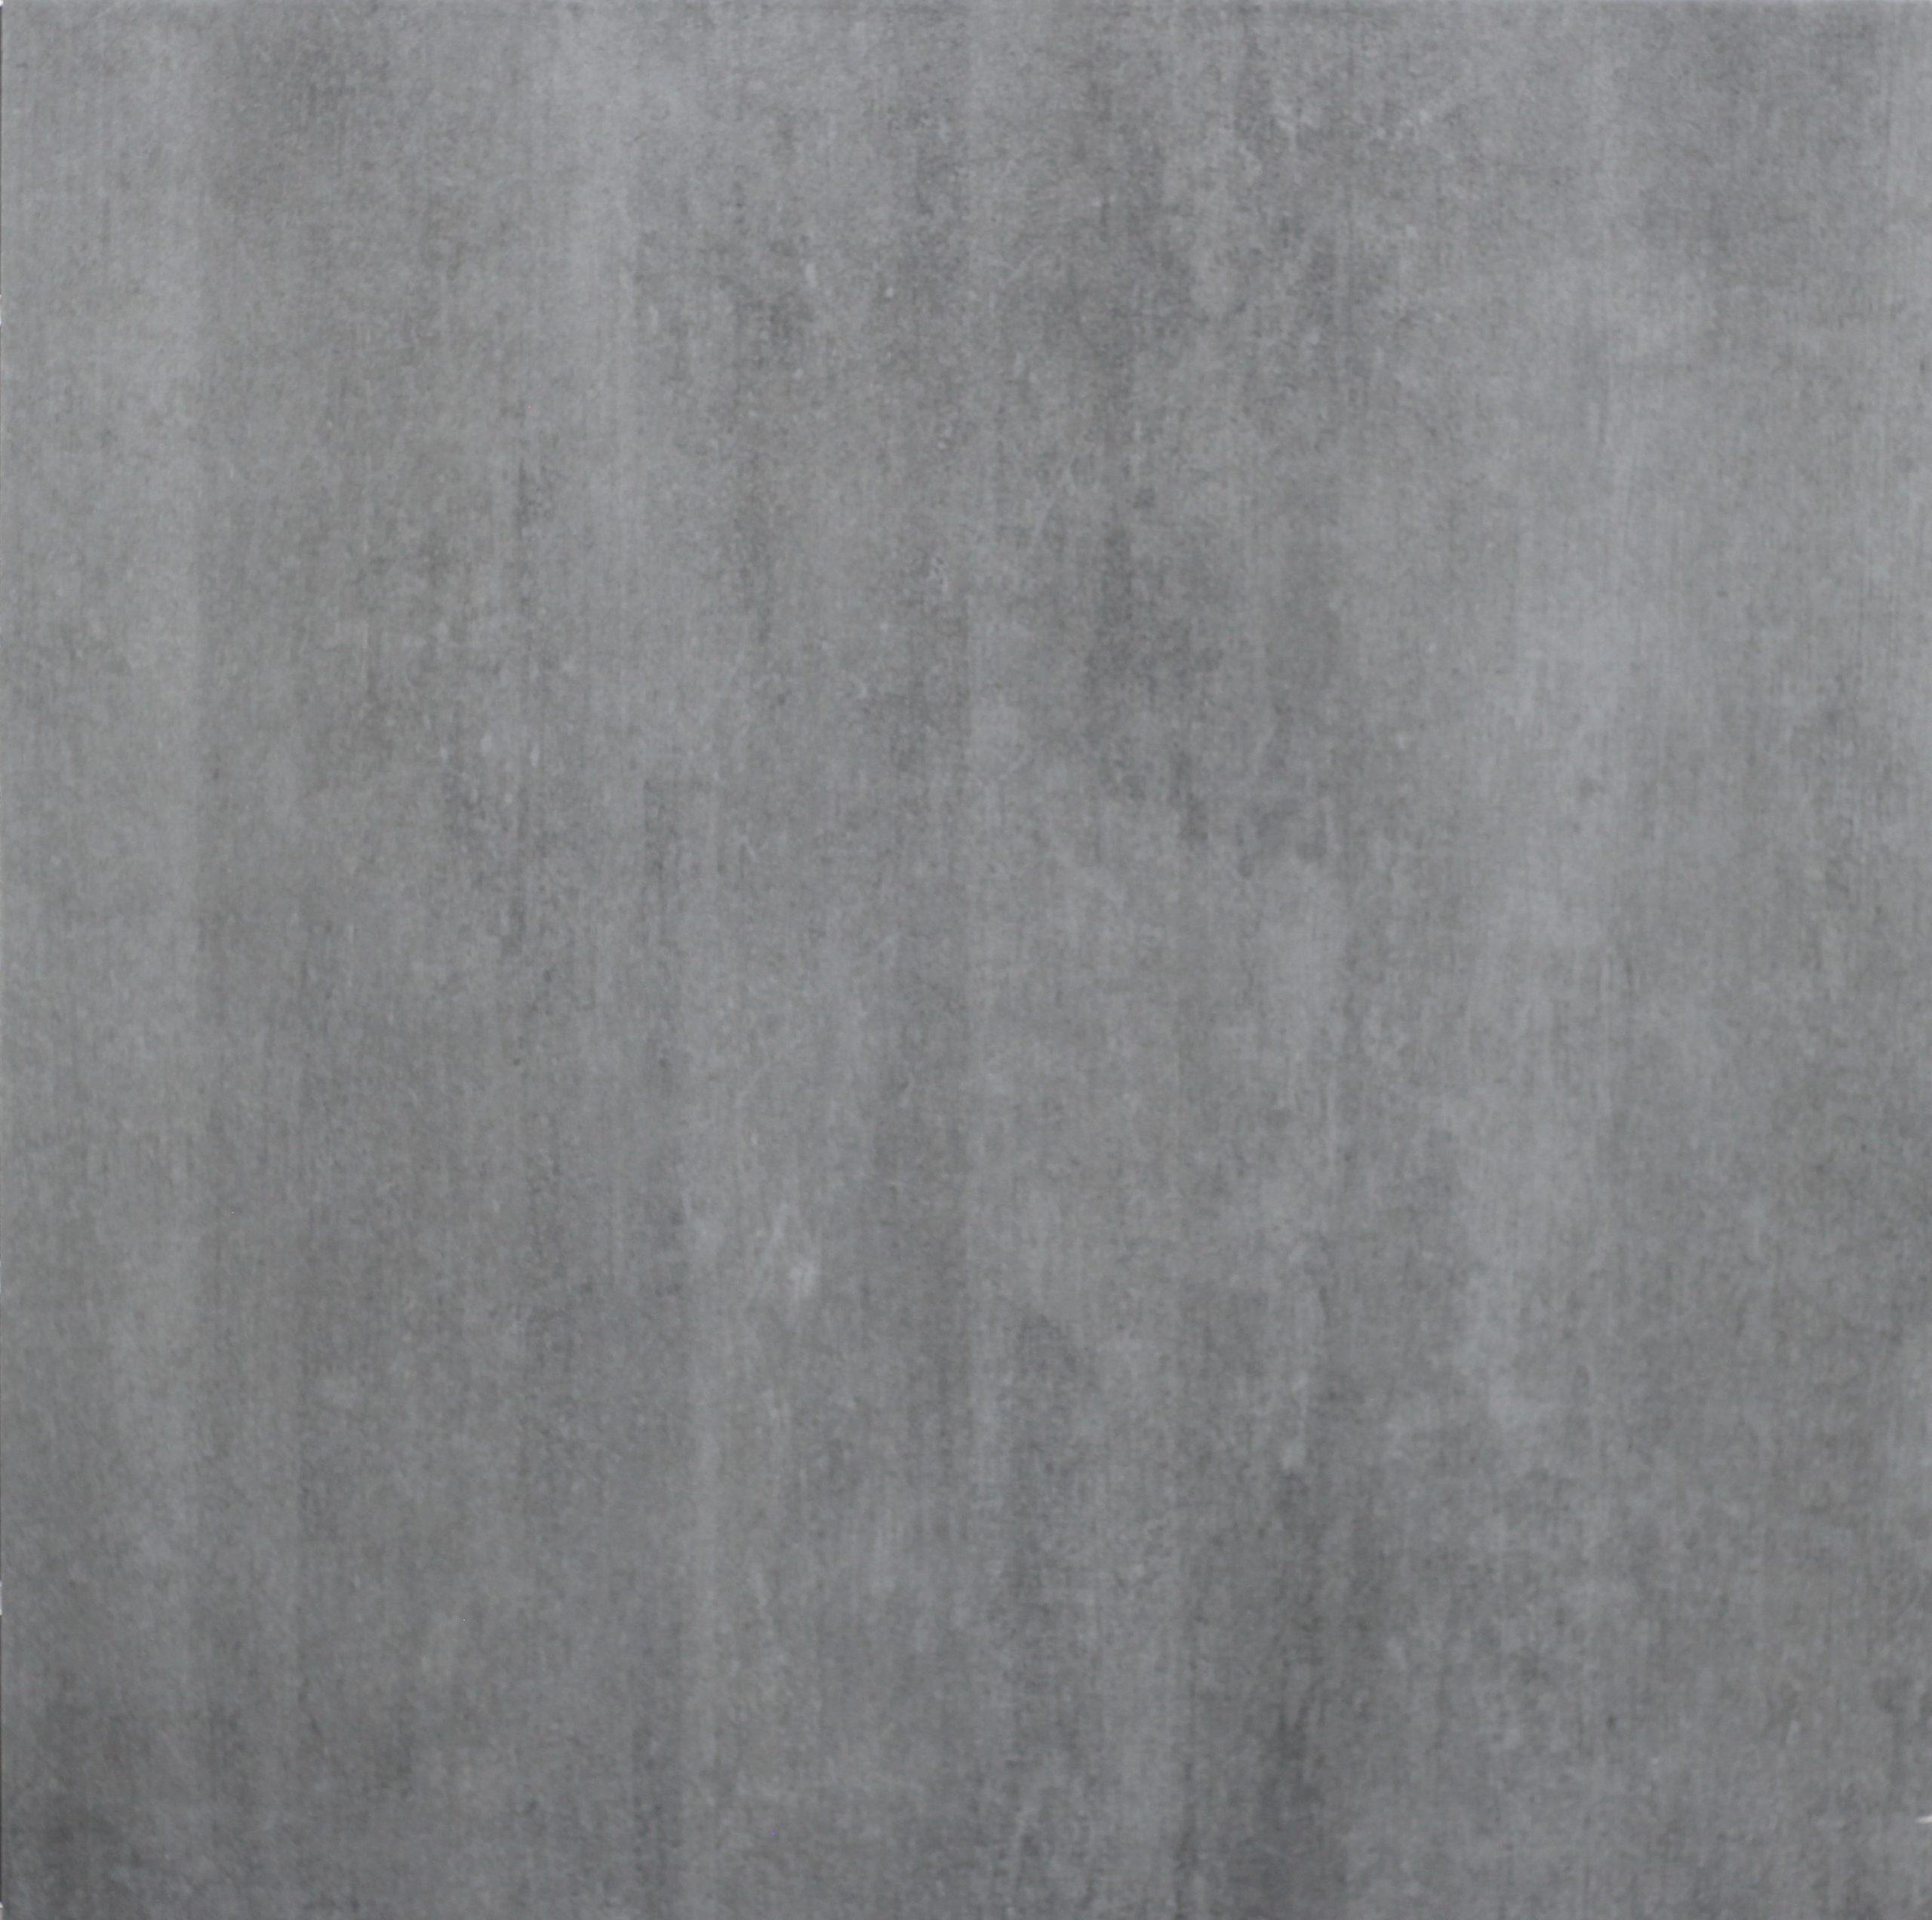 A WOODCRETE NCIA CHARCOAL MATT 450x450mm